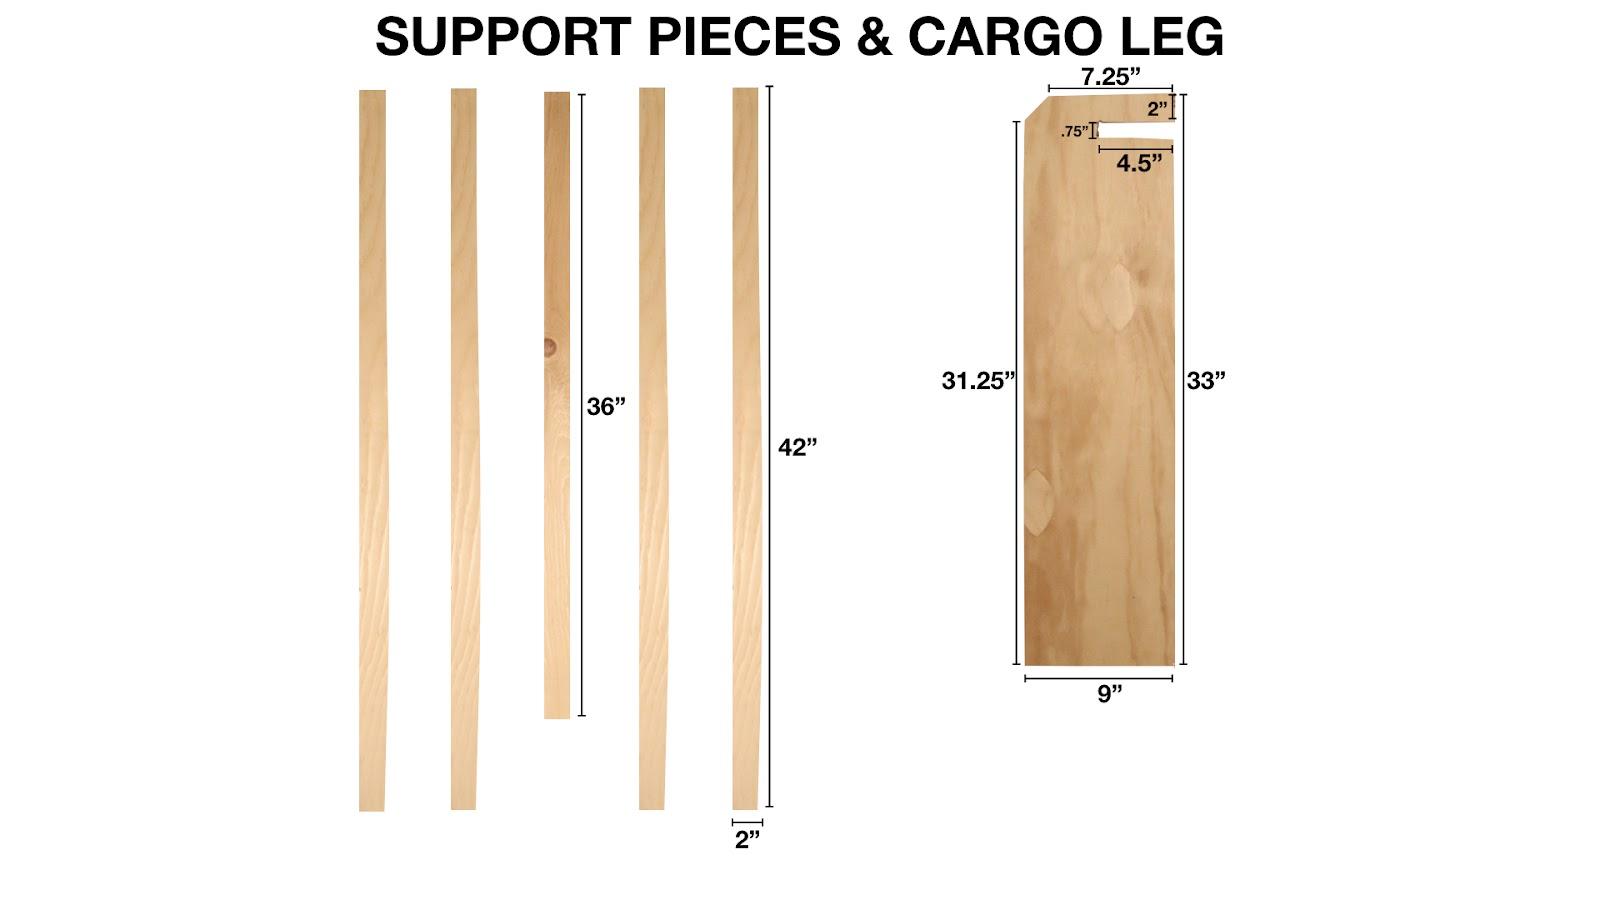 Support Pieces & Cargo Leg